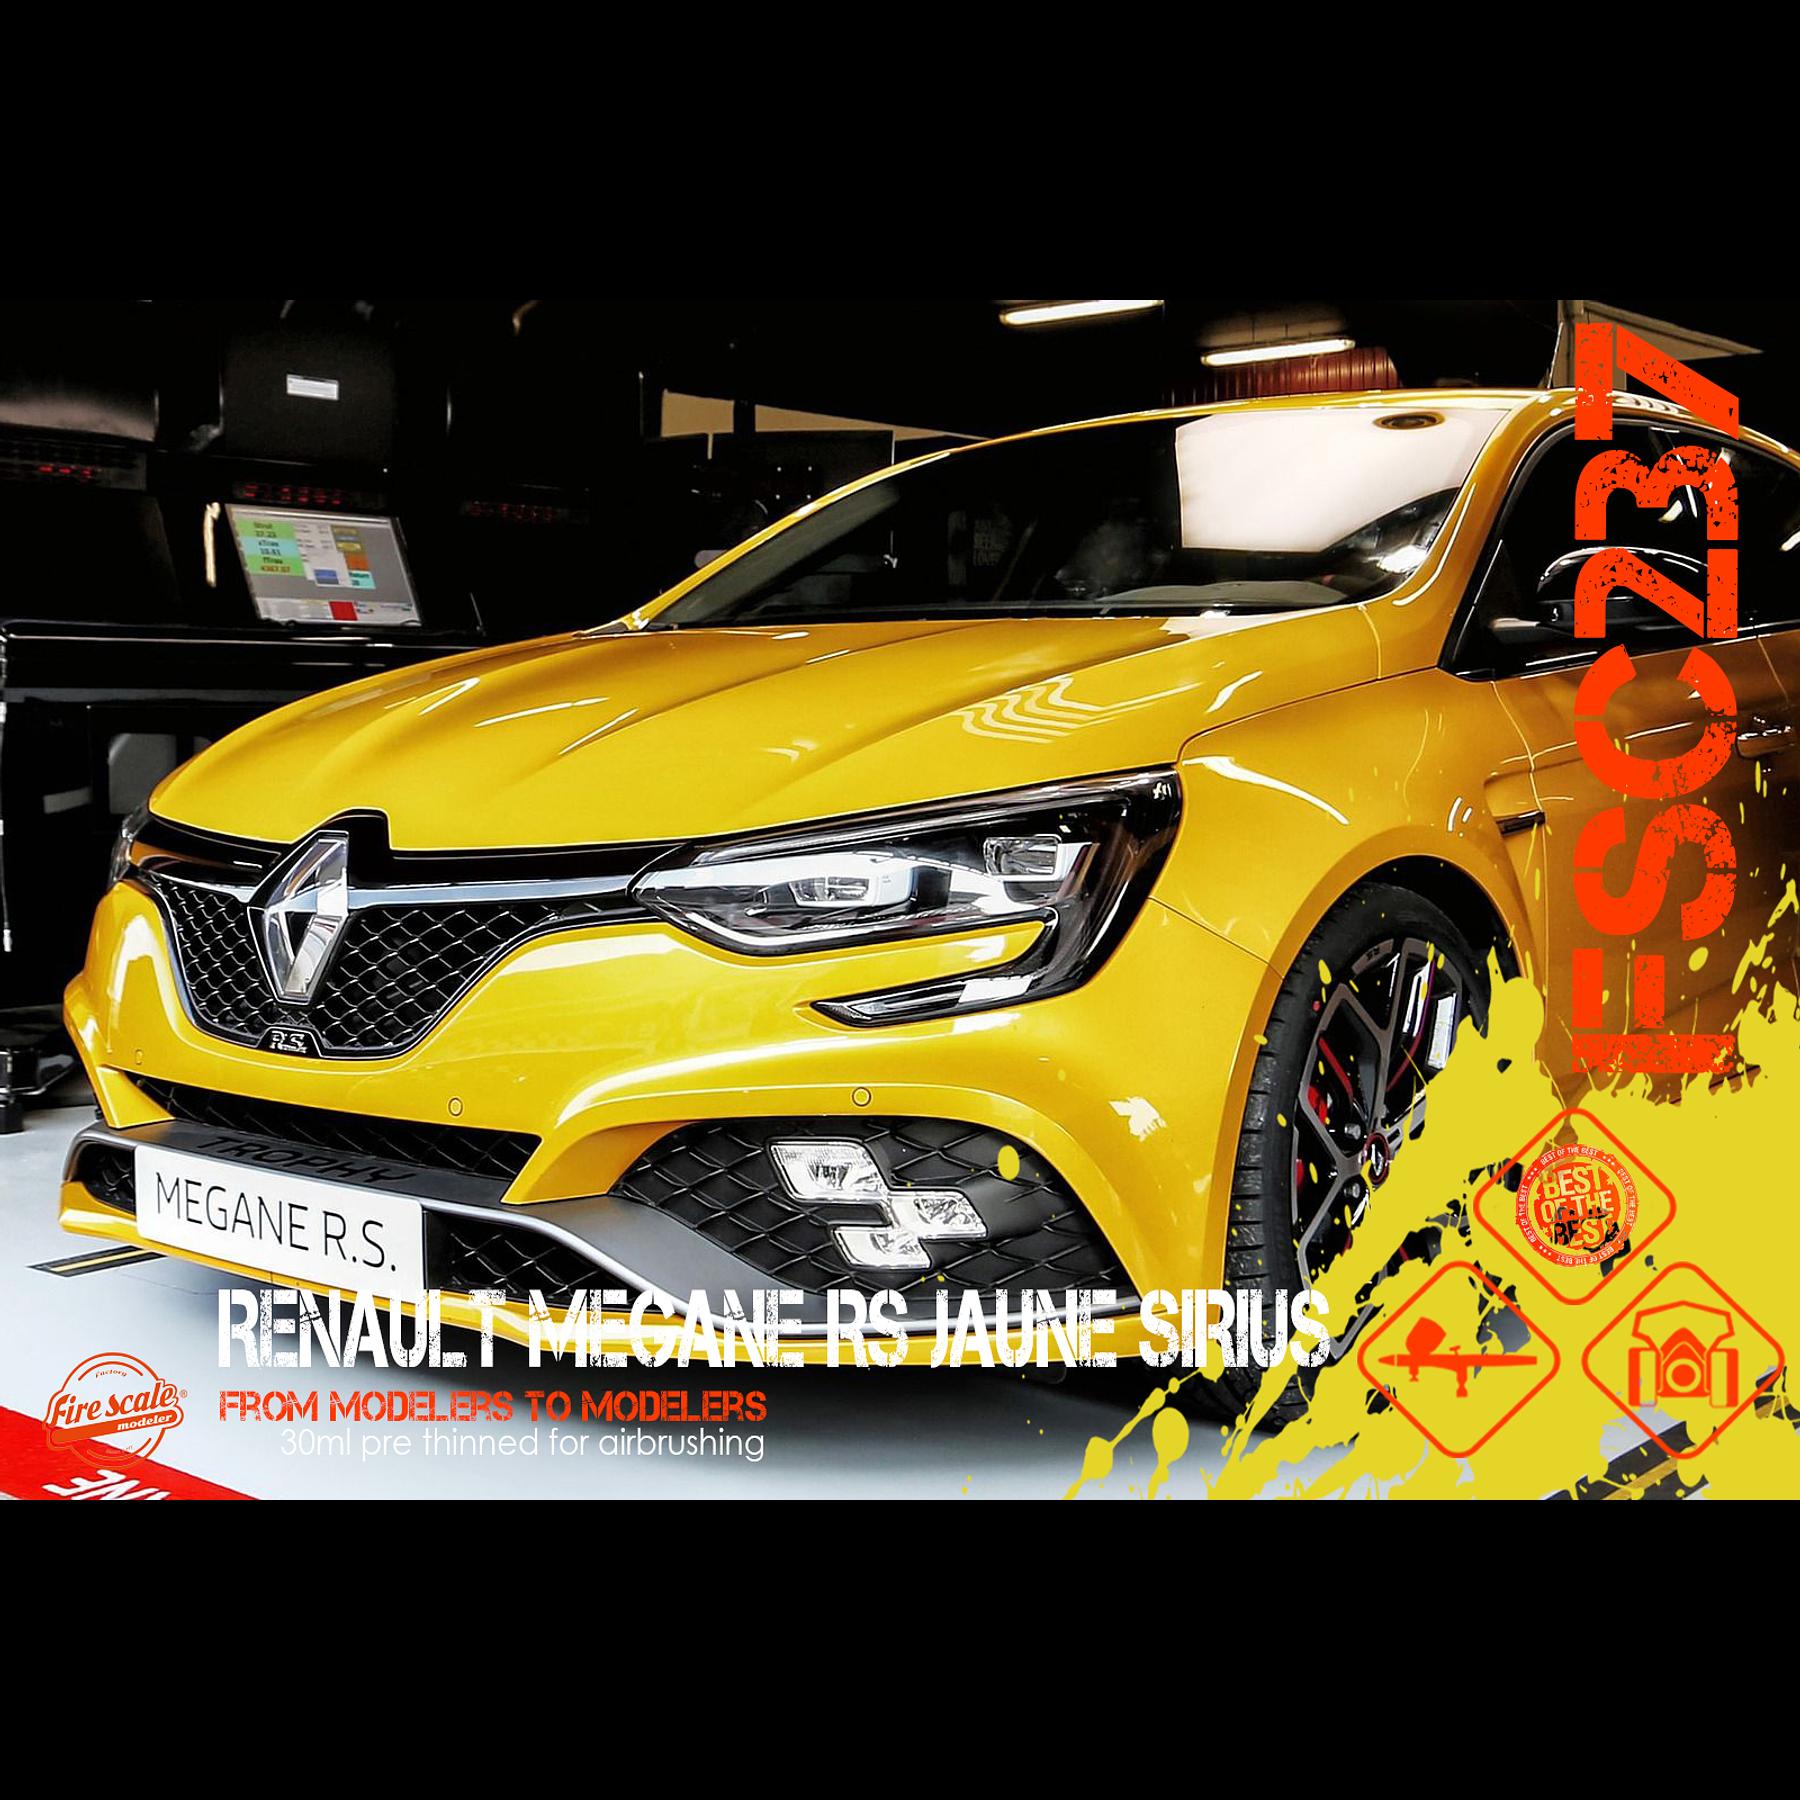 Jaune Sirius Renault